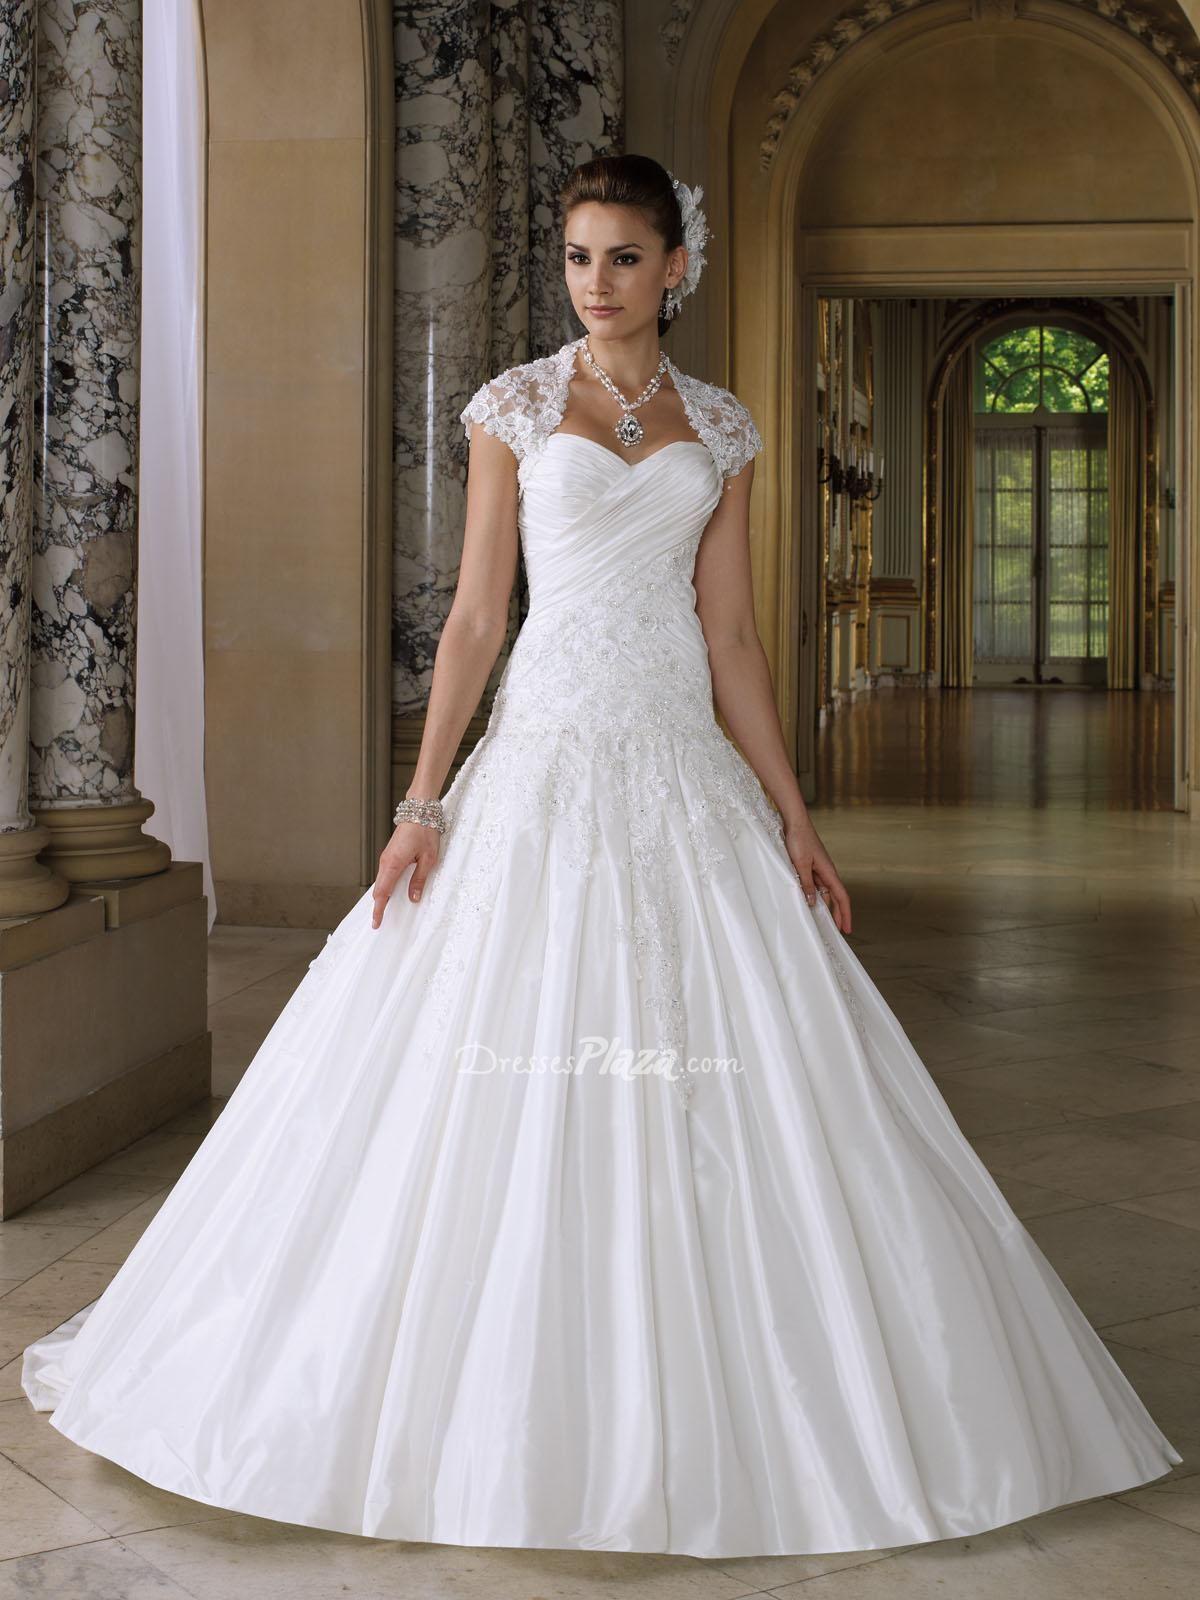 Dropped waist wedding dress  taffeta sweetheart strapless ball gown dropped waist wedding dress